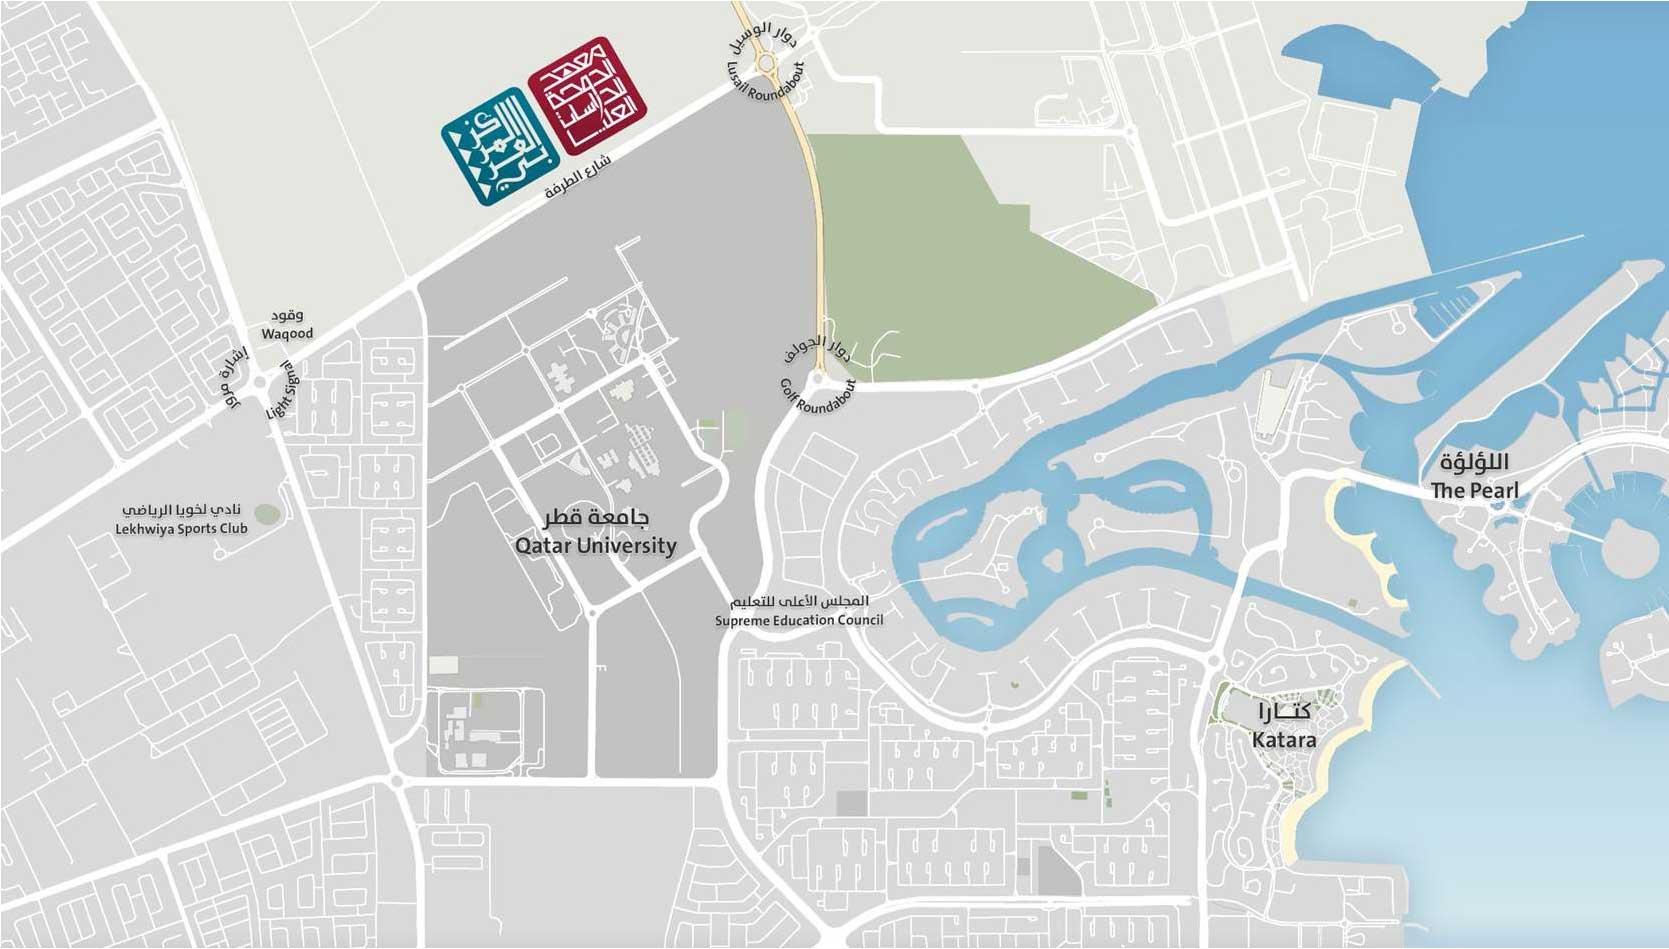 Contact Us Doha Insute - on lilongwe area map, beijing area map, cairo area map, kowloon area map, warsaw area map, bahrain area map, macau area map, berlin area map, hyderabad area map, hangzhou area map, bilbao area map, alexandria area map, rotterdam area map, phnom penh area map, baghdad area map, kyoto area map, mosul area map, qatar area map, narita area map, kuala lumpur area map,